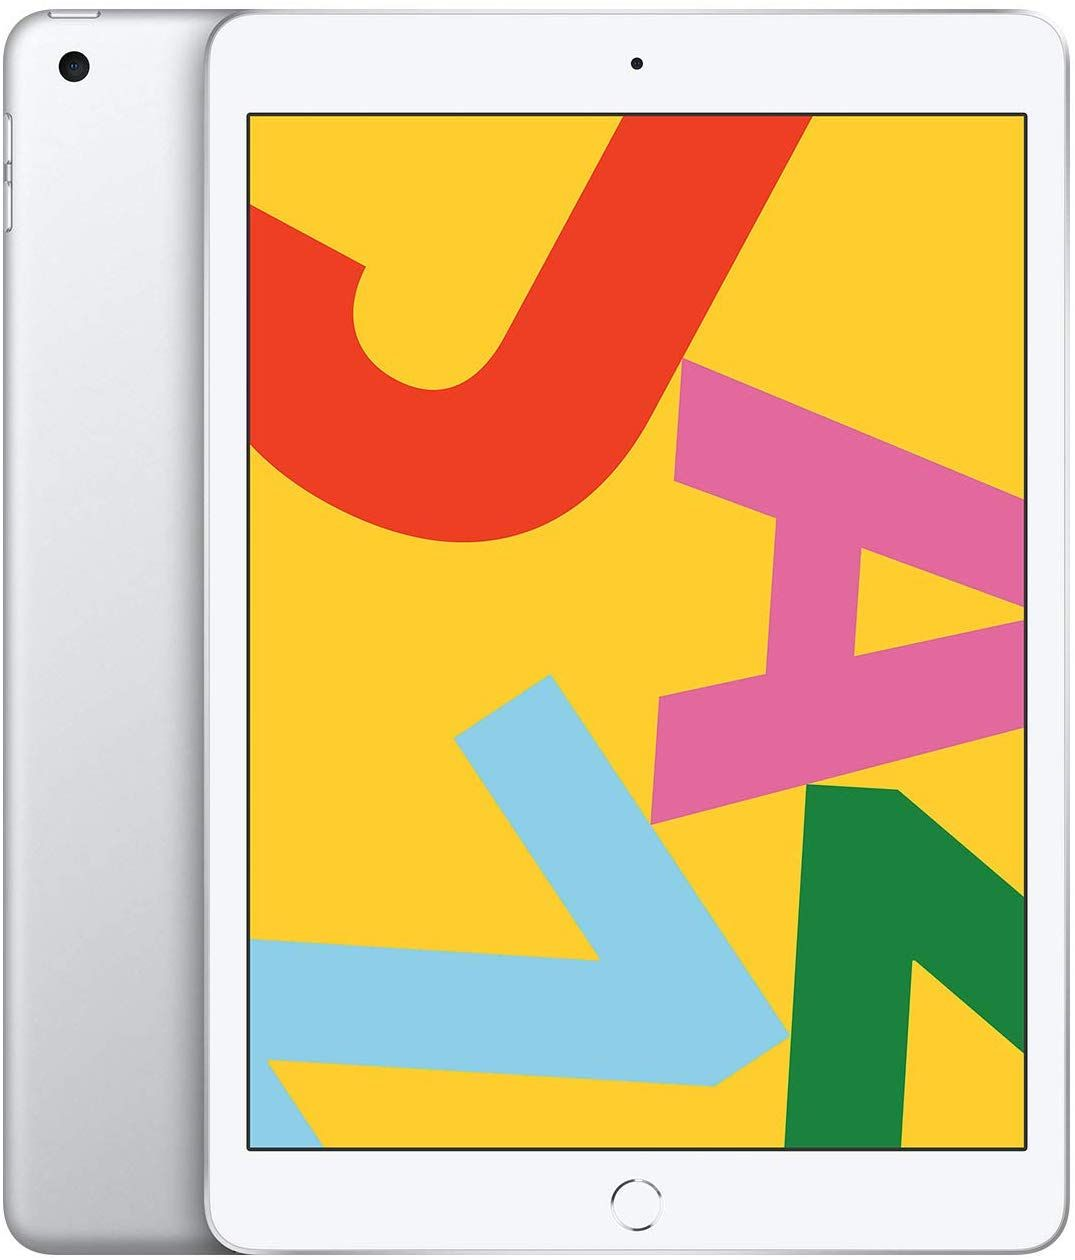 sale model ipad latest